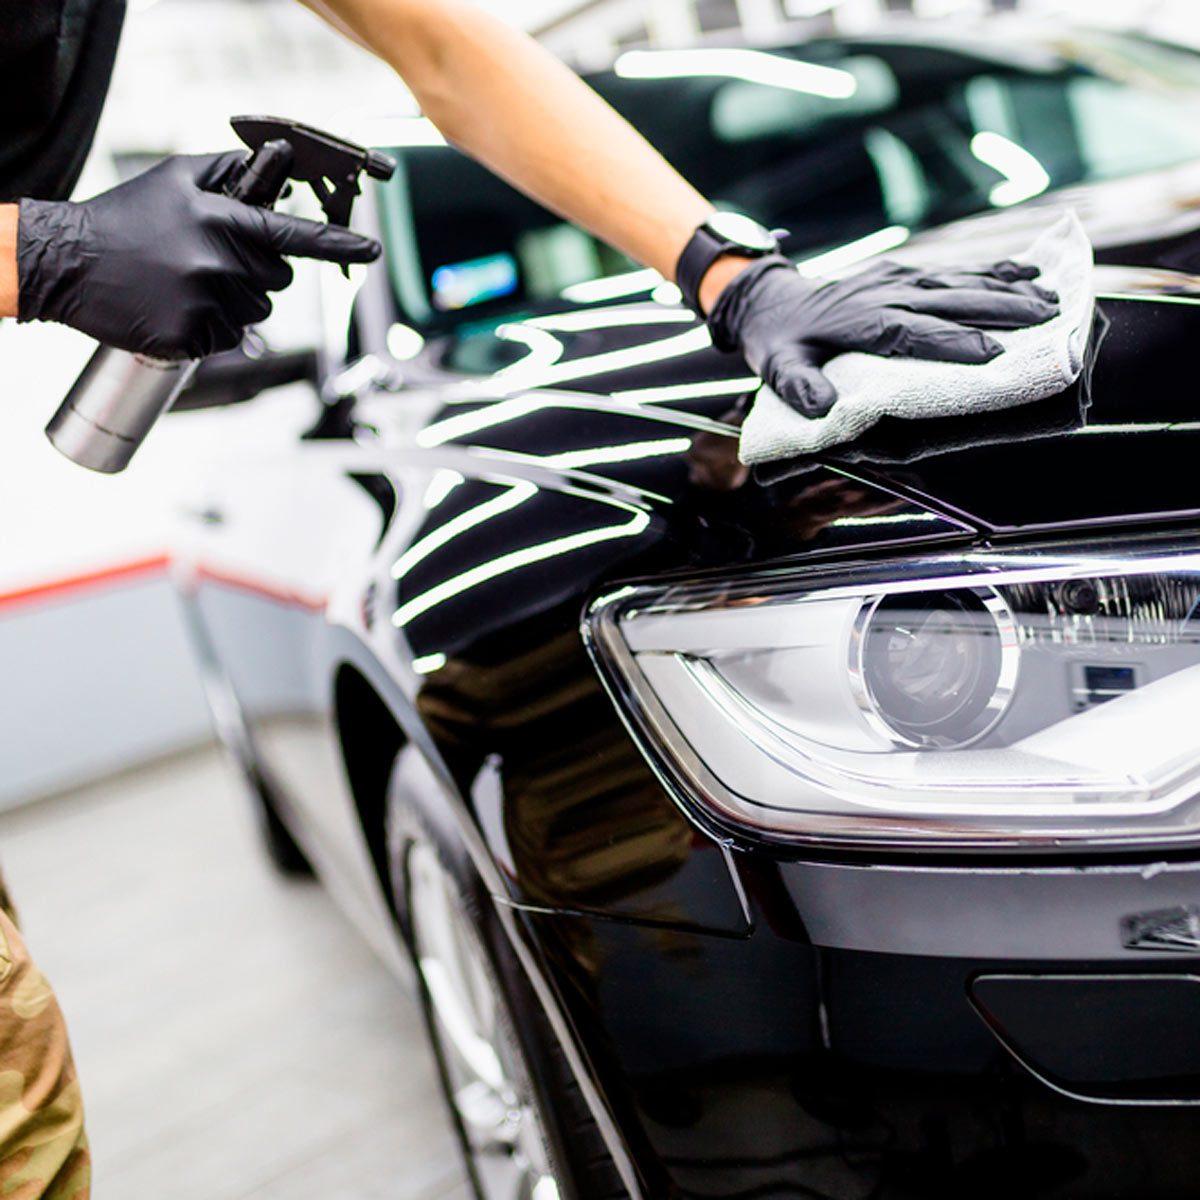 Cleaning car hood